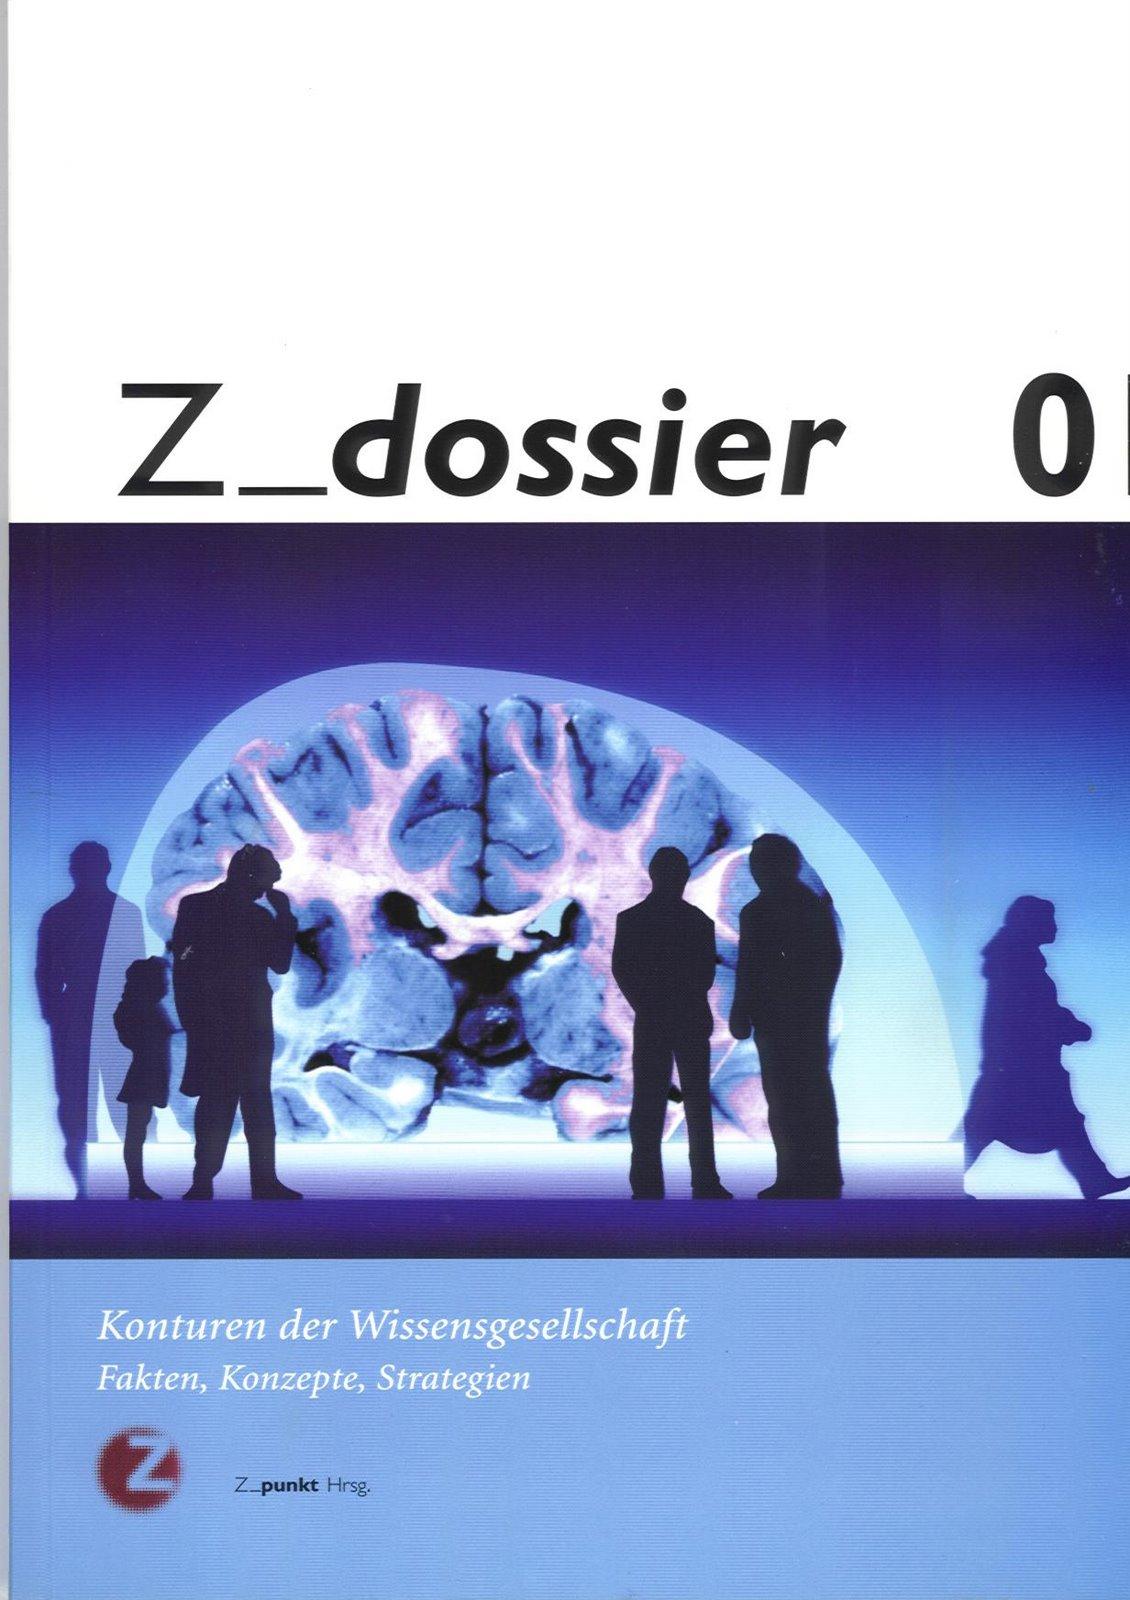 [Z-dossier+Saiger.jpg]